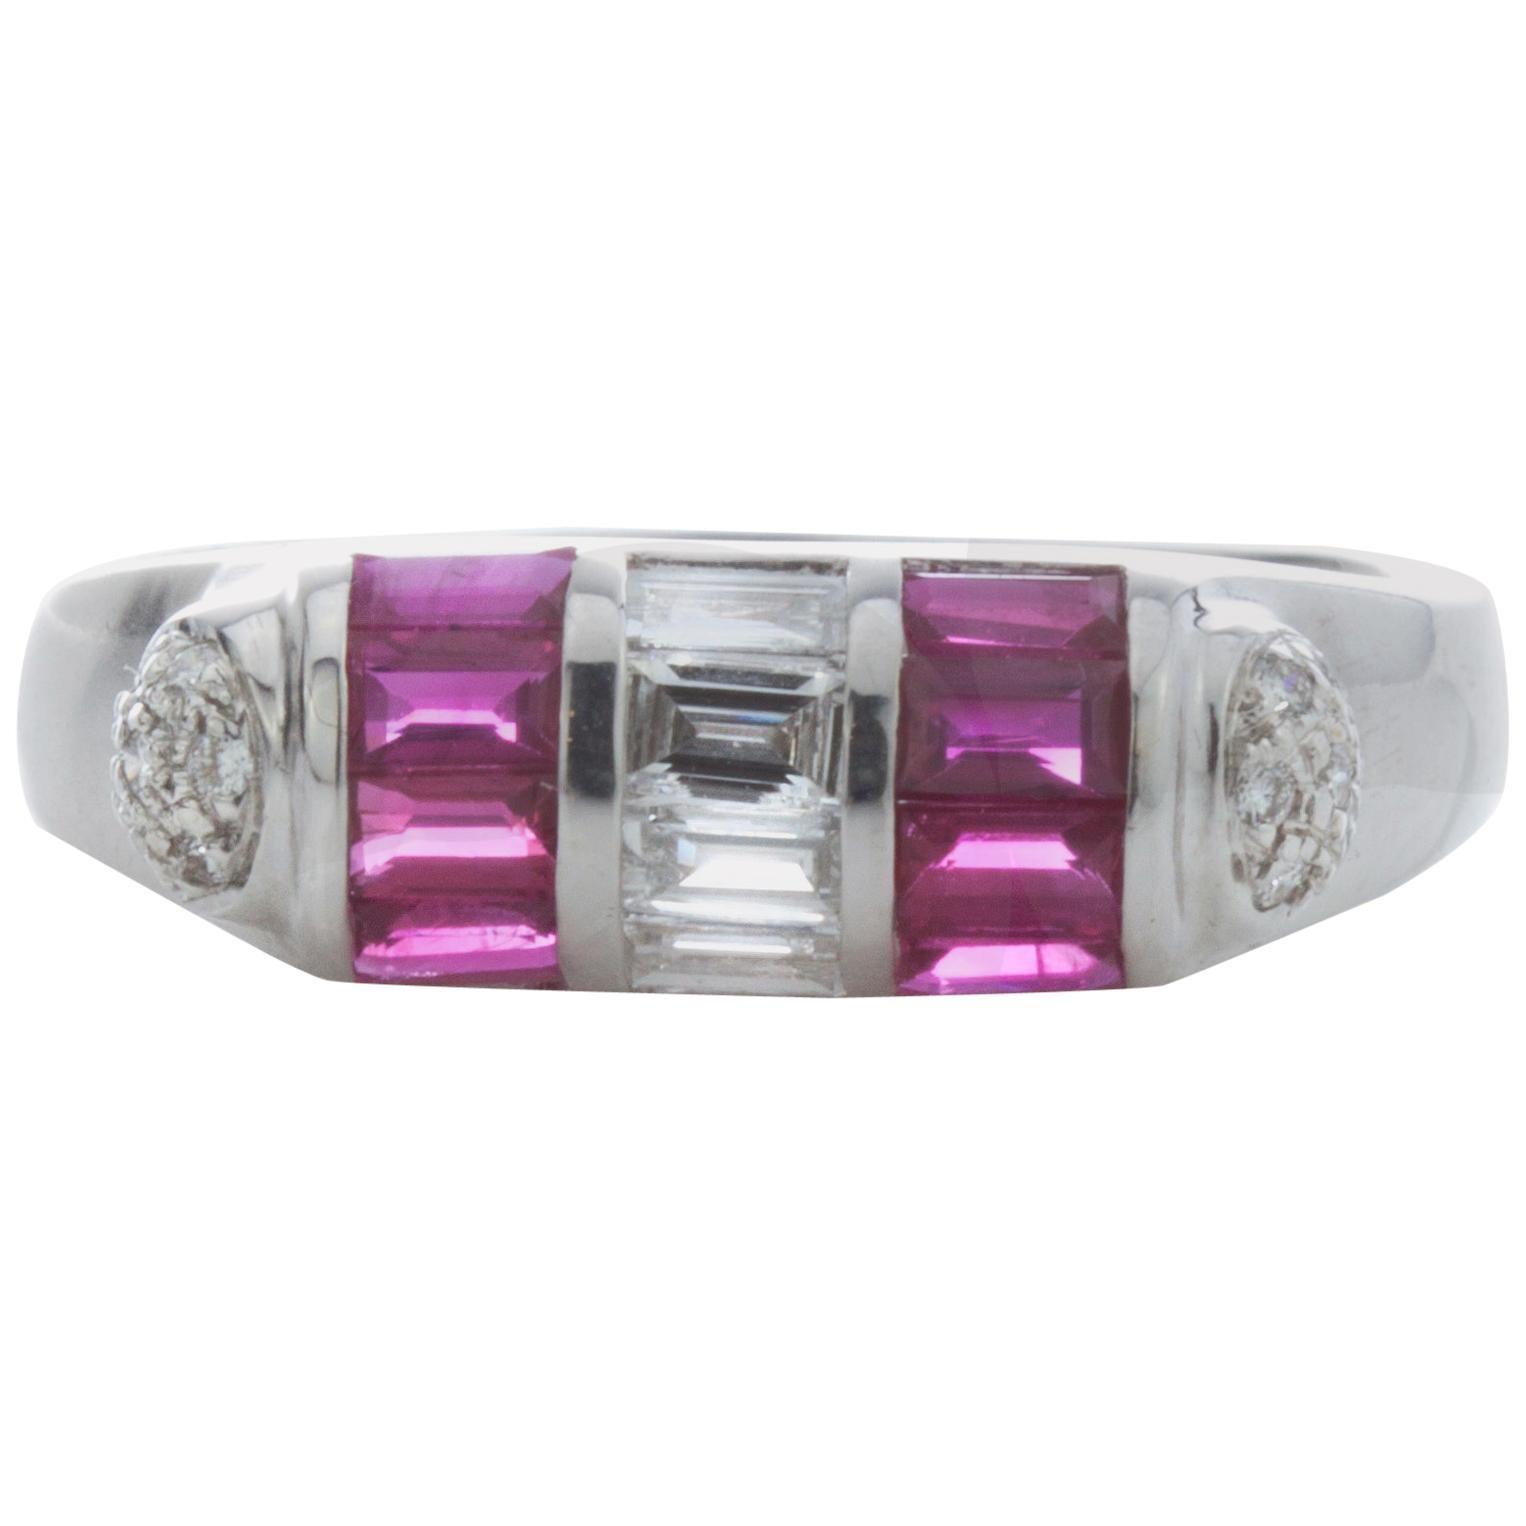 18 Karat White Gold Ladies Ring with Rubies and Diamonds